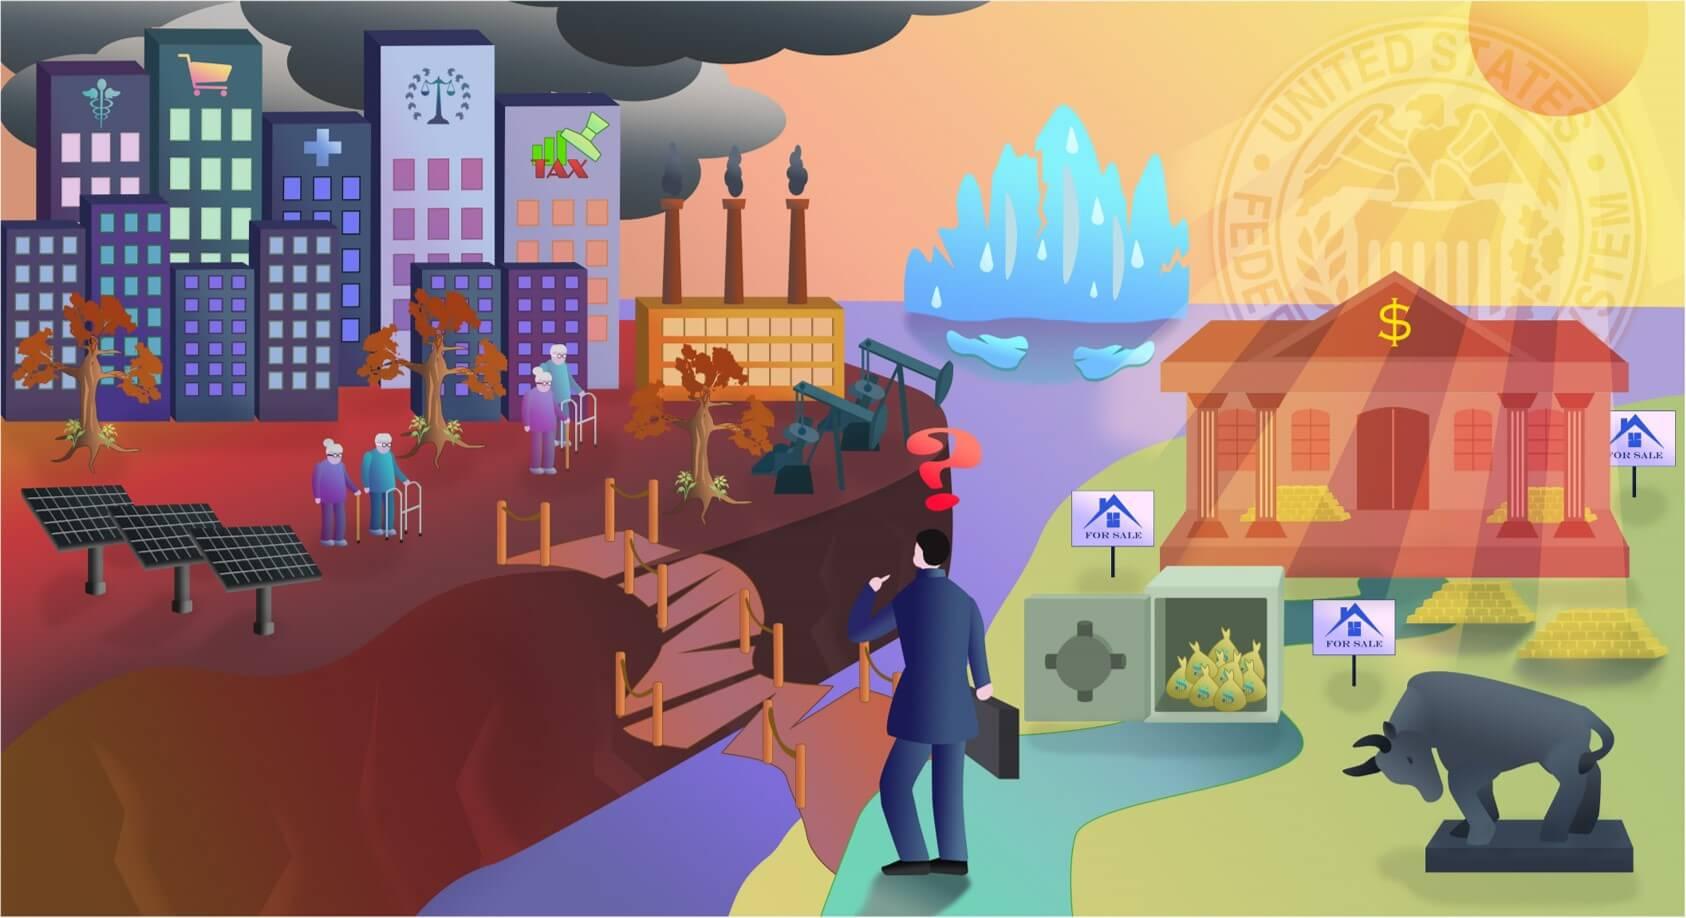 SCÉNARIO Juin 2020 : Omnipotence des banques centrales, capitalisme financier et capital productif